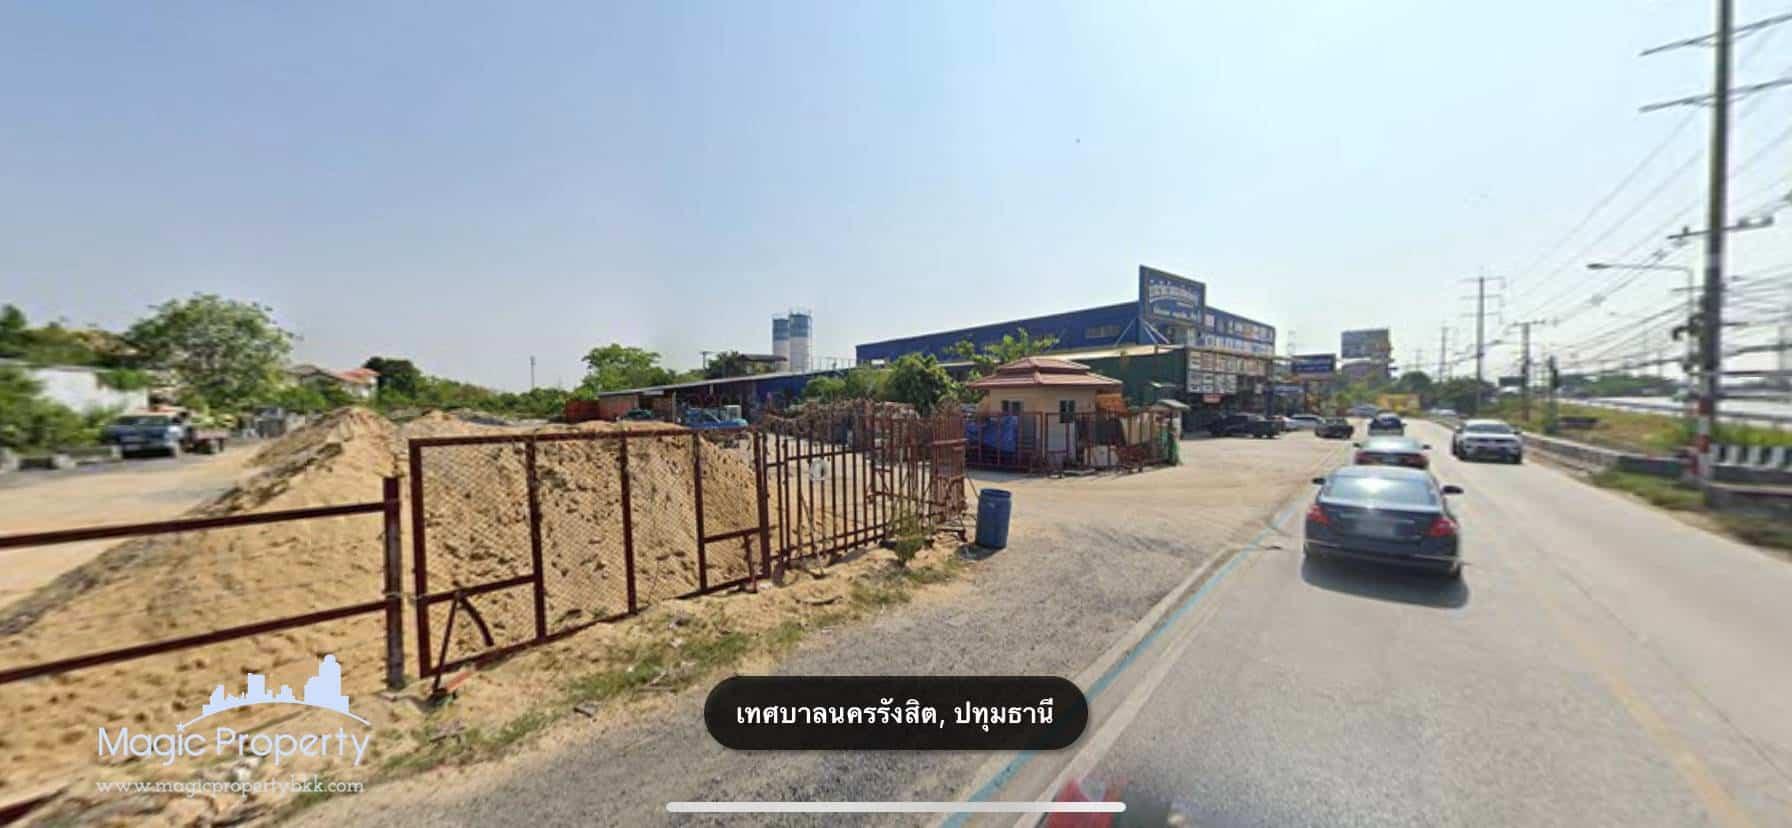 38 Rai Land For Sale in Rangsit, Prachathipat, Thanyaburi, Pathum Thani